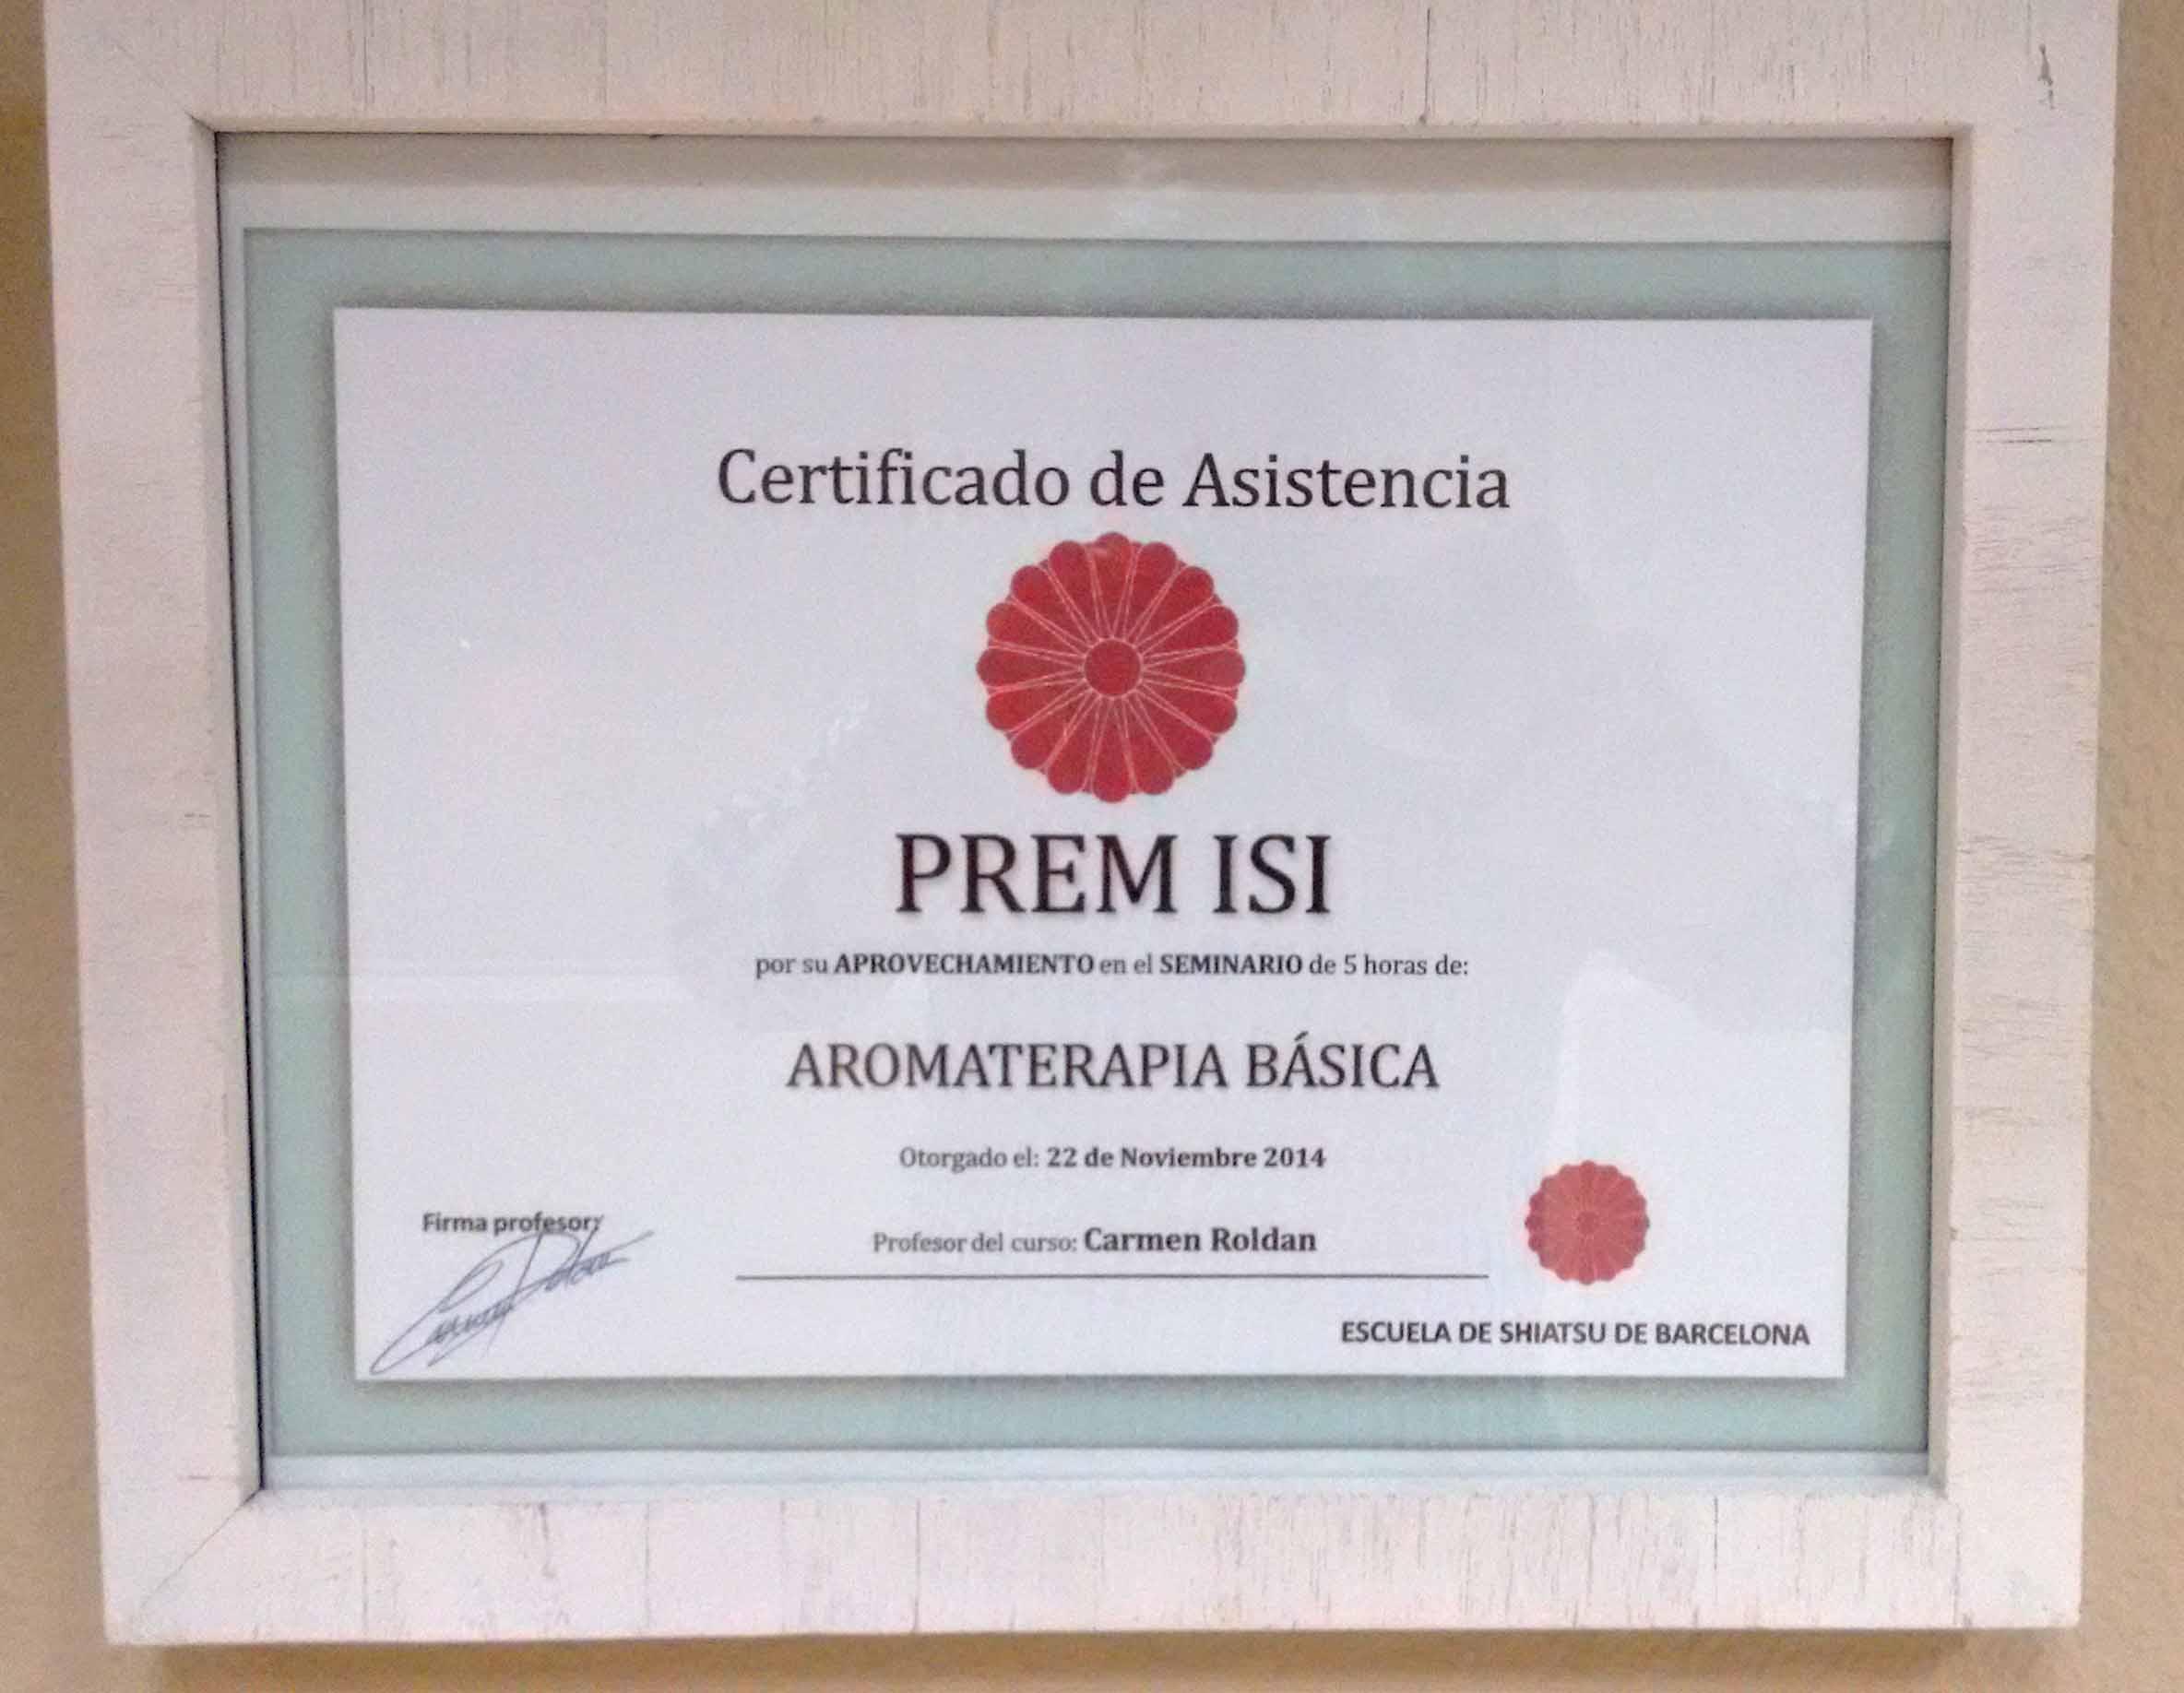 Aromaterapia Básica